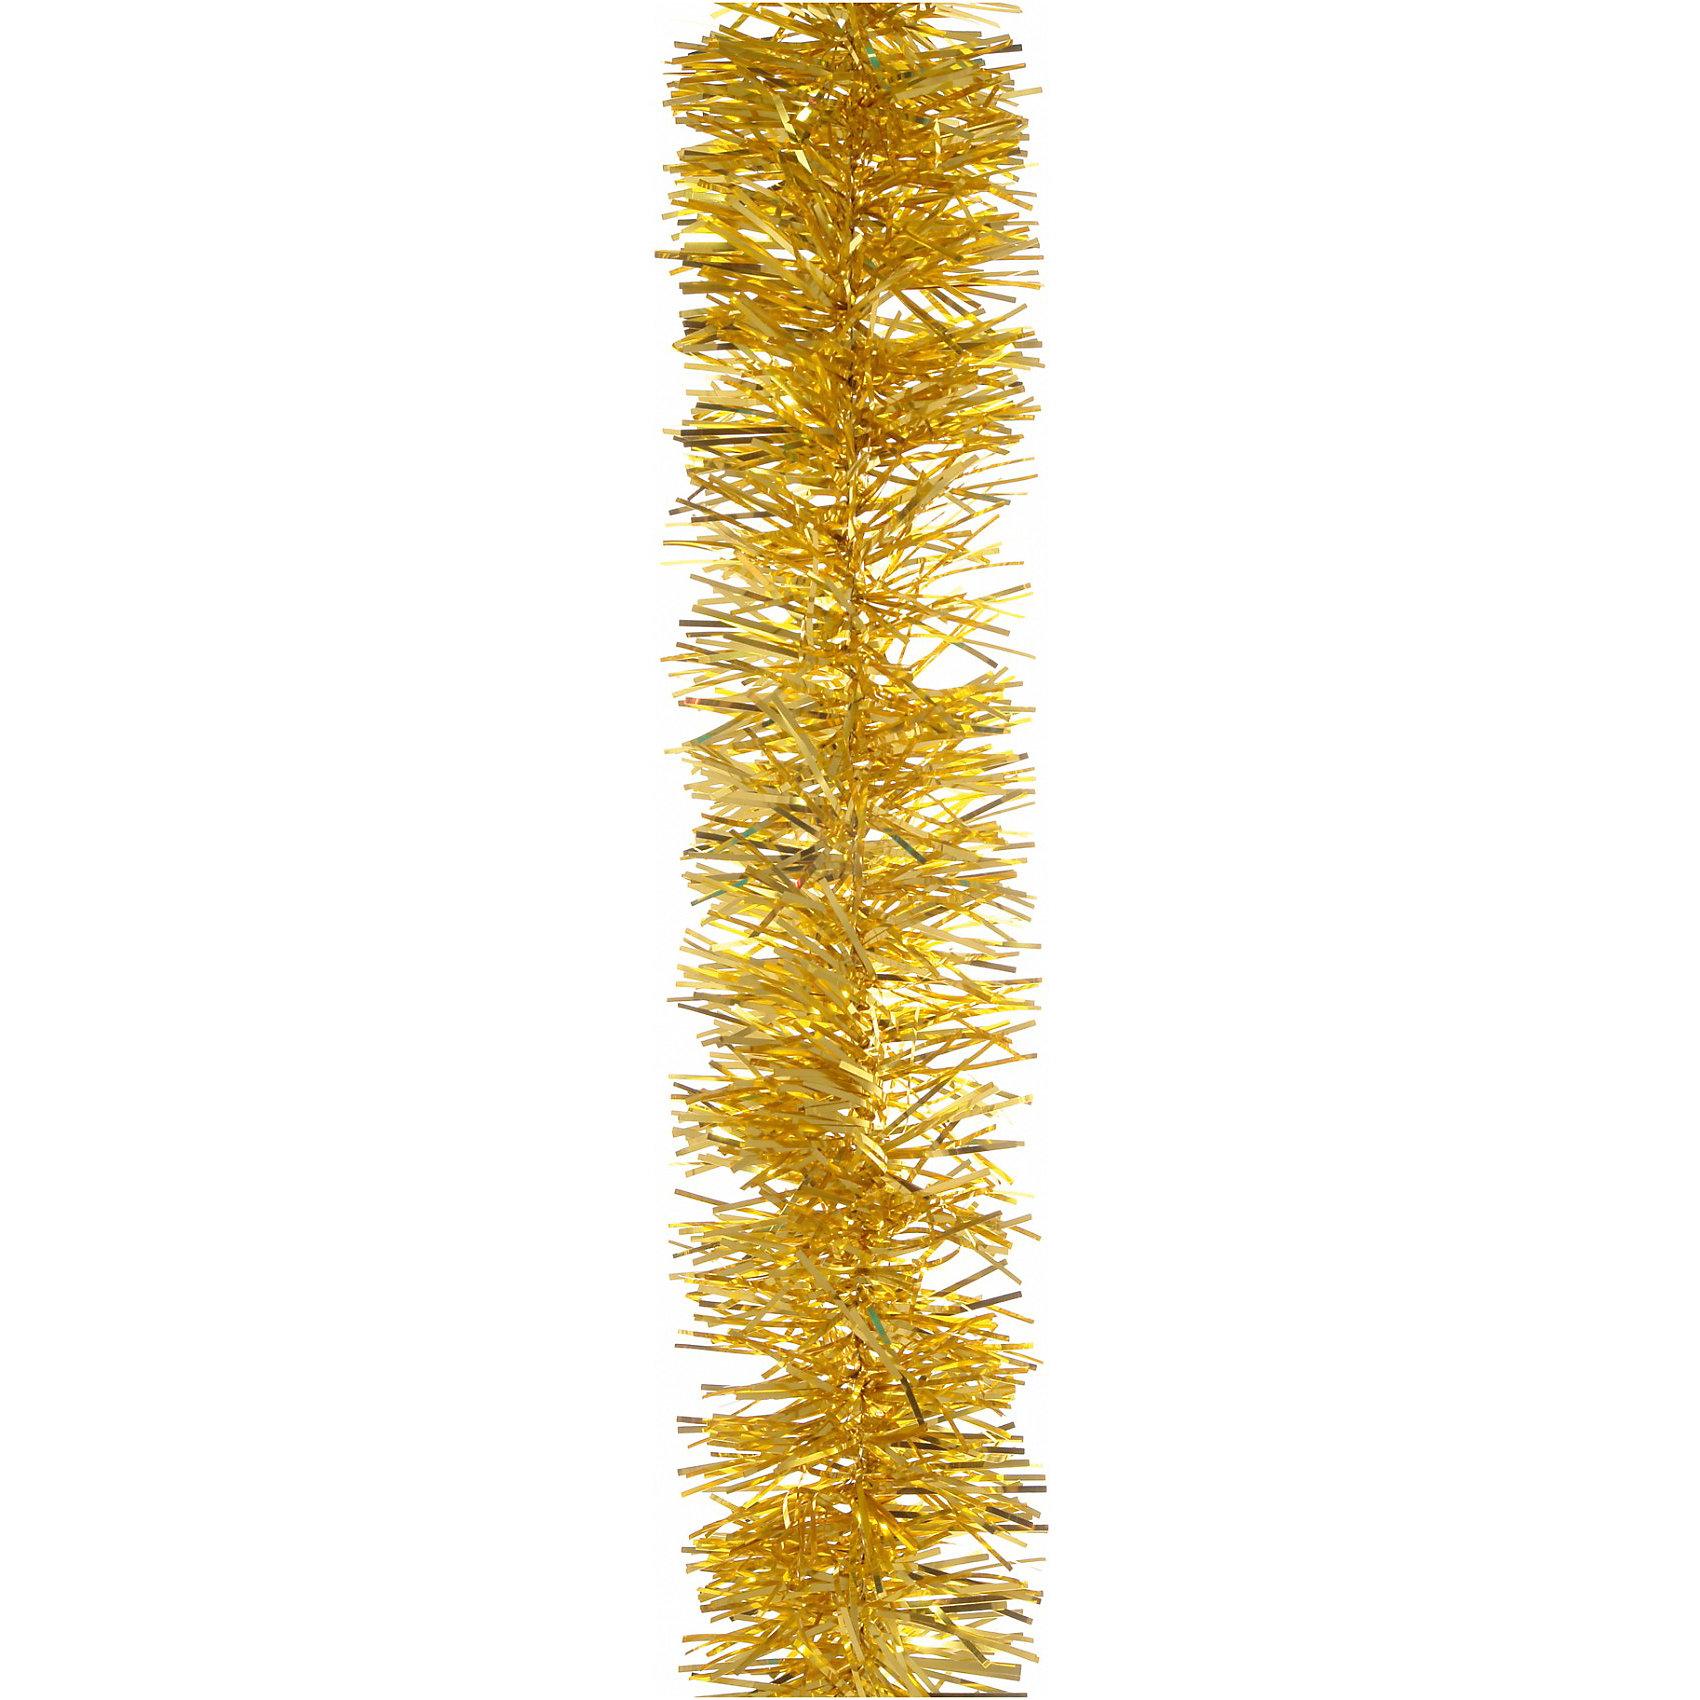 Мишура, 4 слоя, 7 см х 2 м, цвет - золото